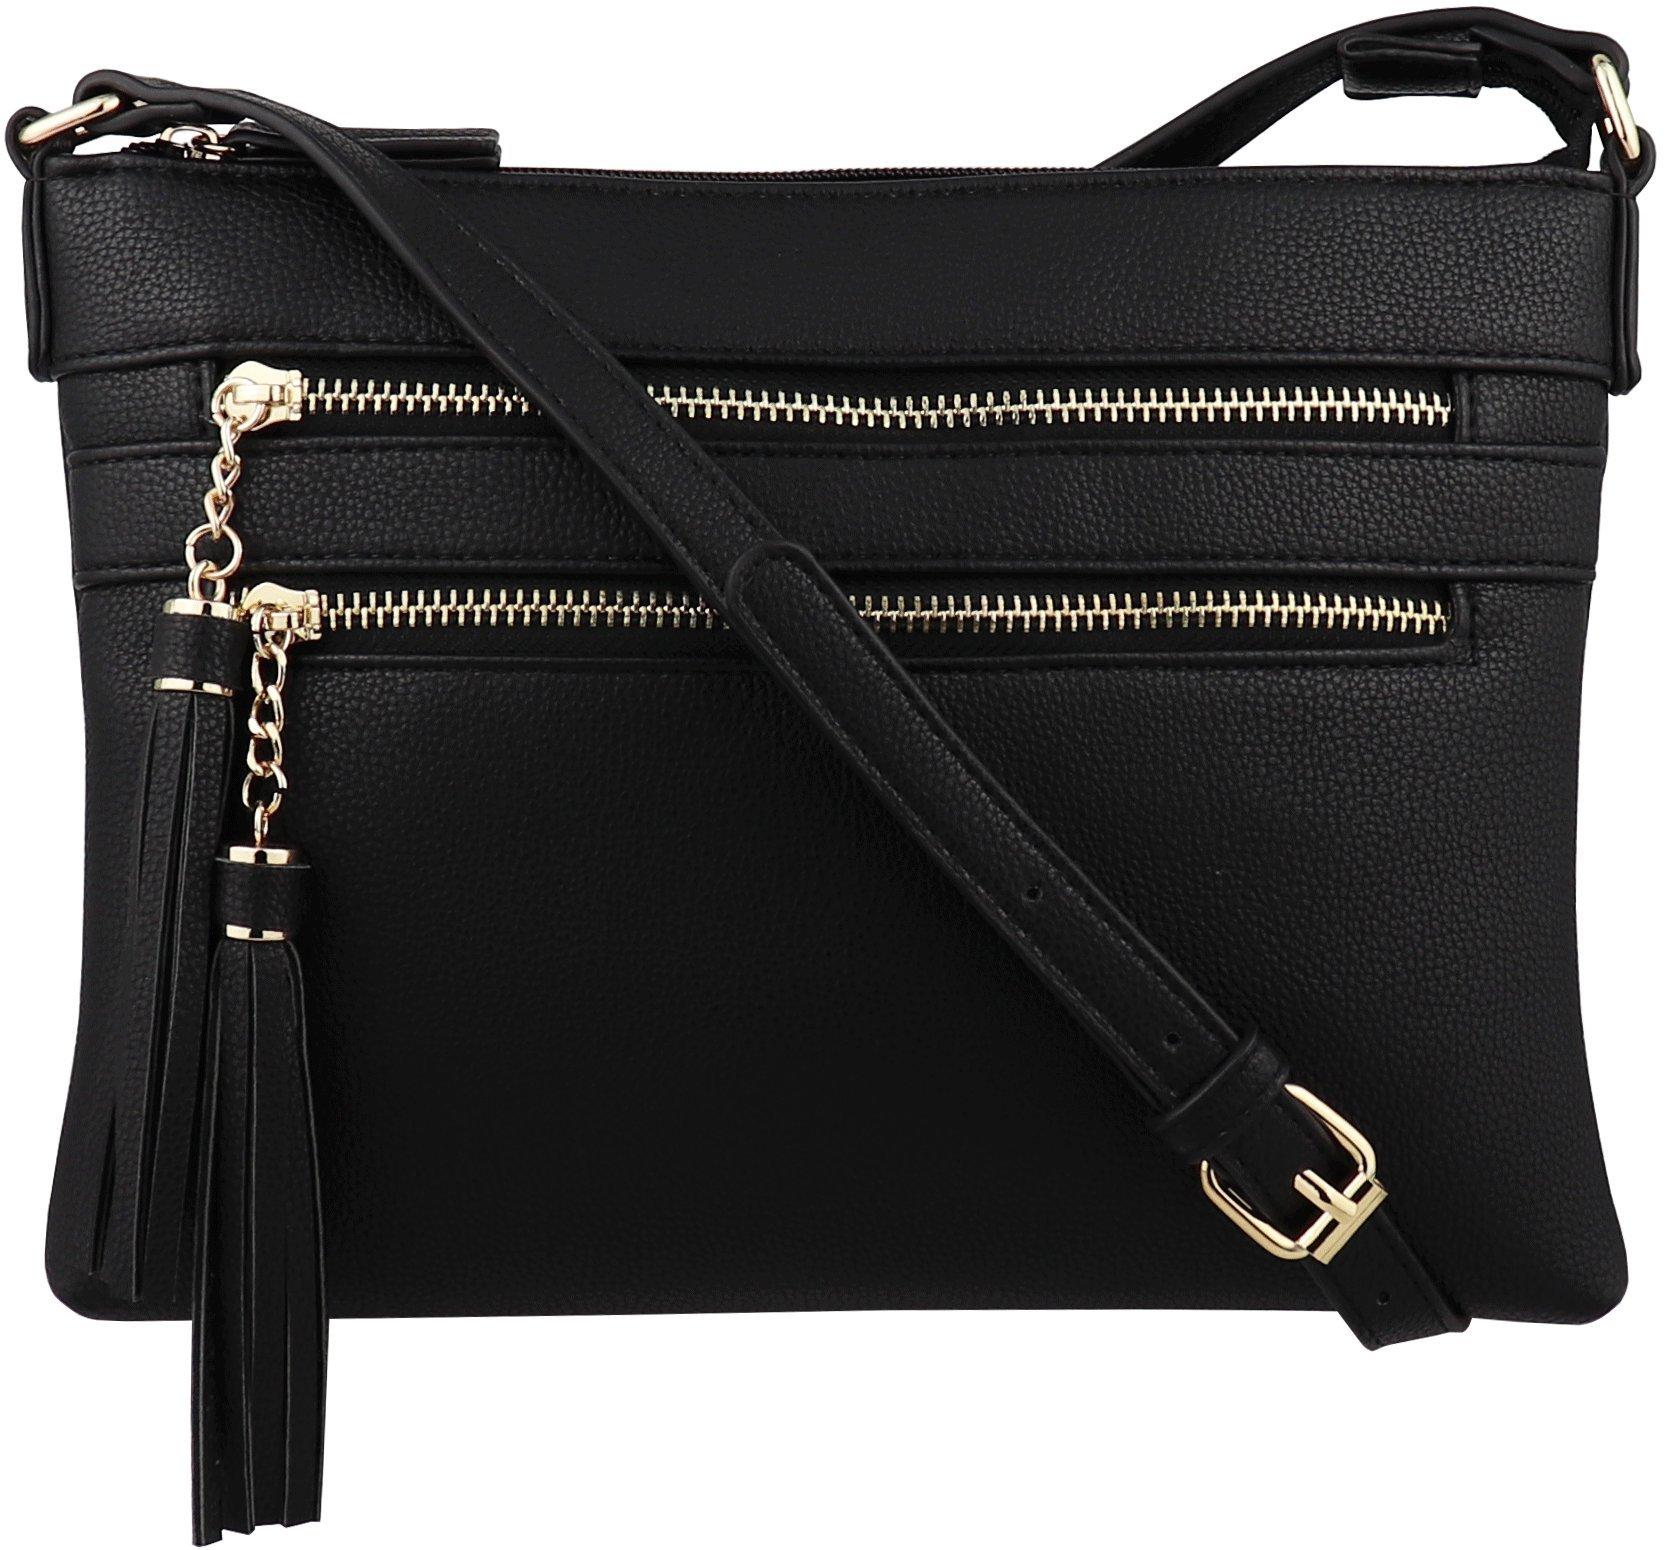 B BRENTANO Vegan Multi-Zipper Crossbody Handbag Purse with Tassel Accents (Black 1)